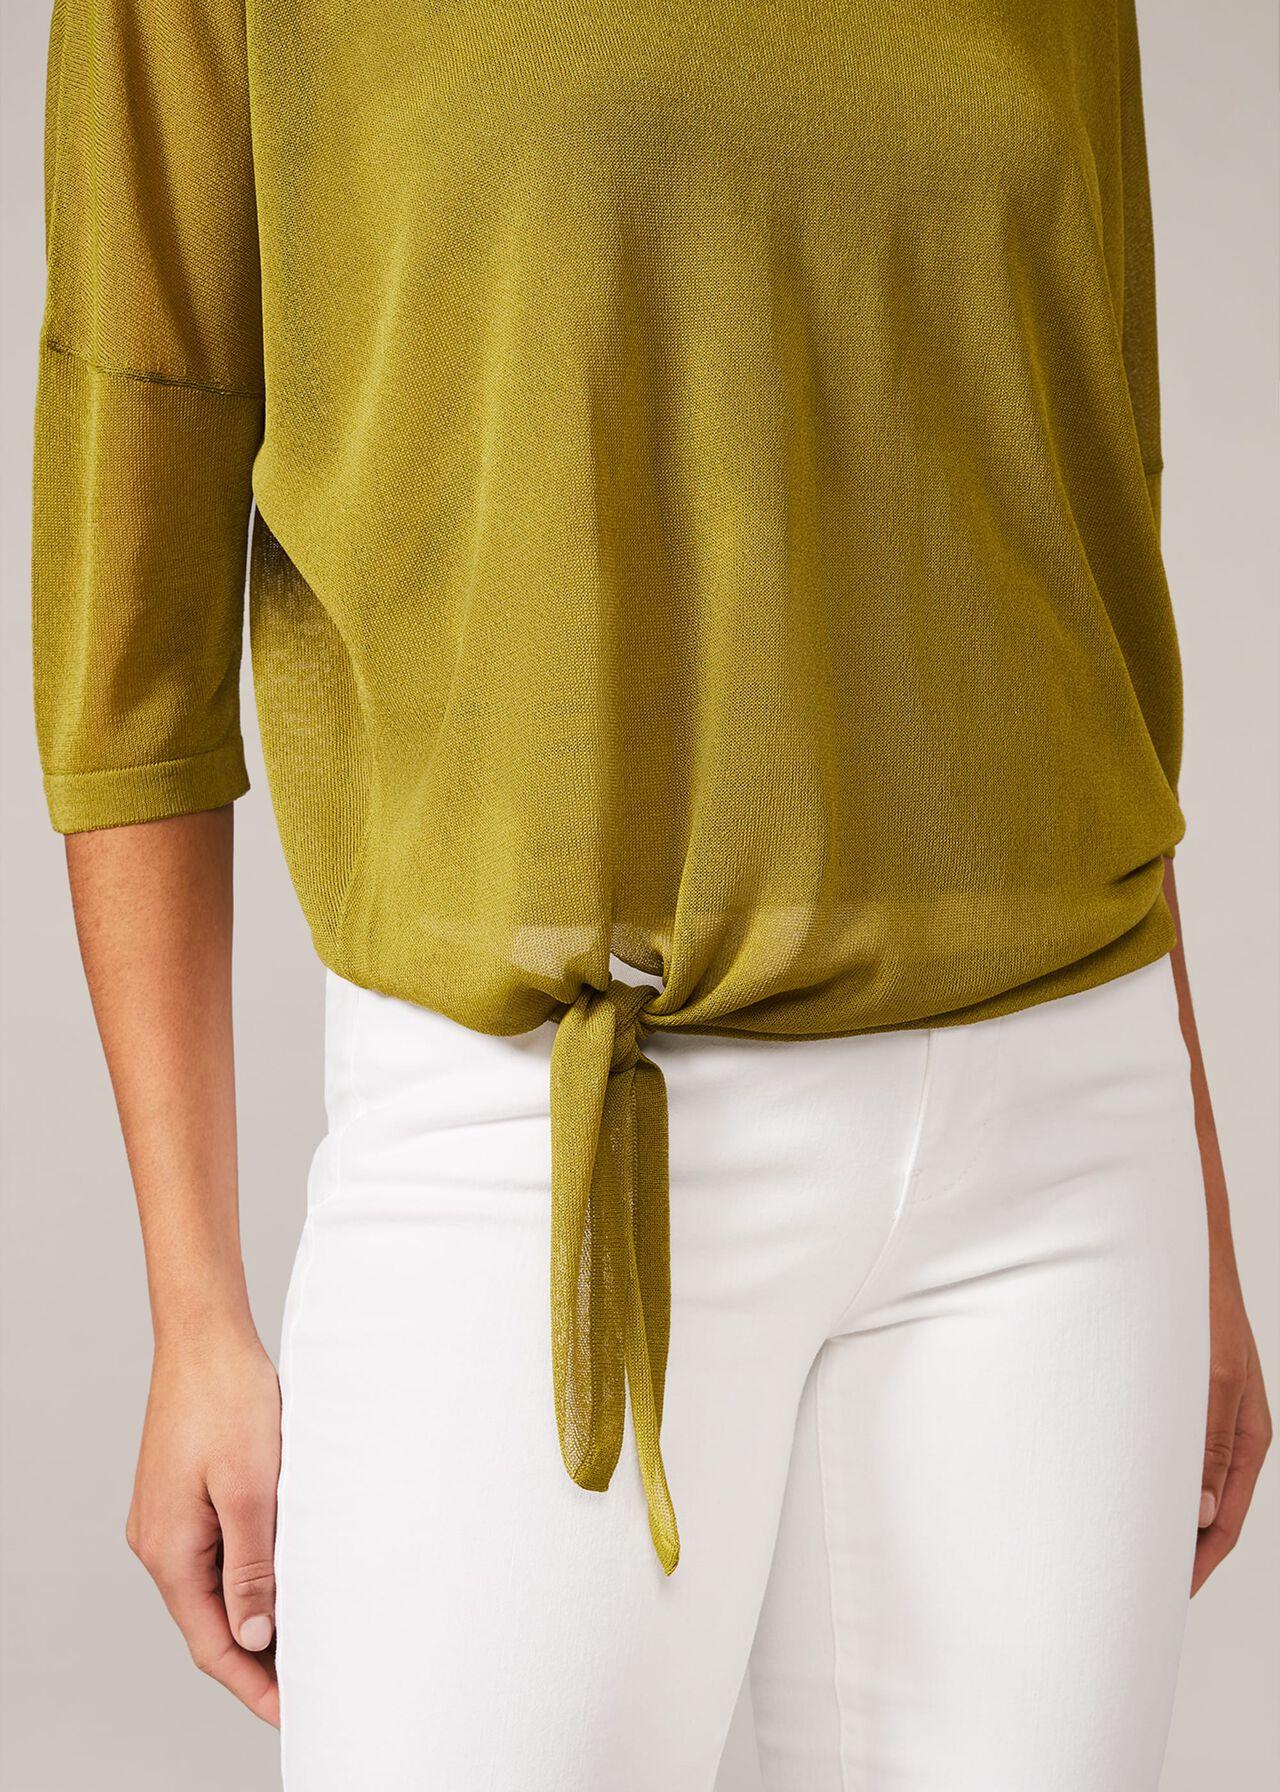 Nat Tie Side Knit Top